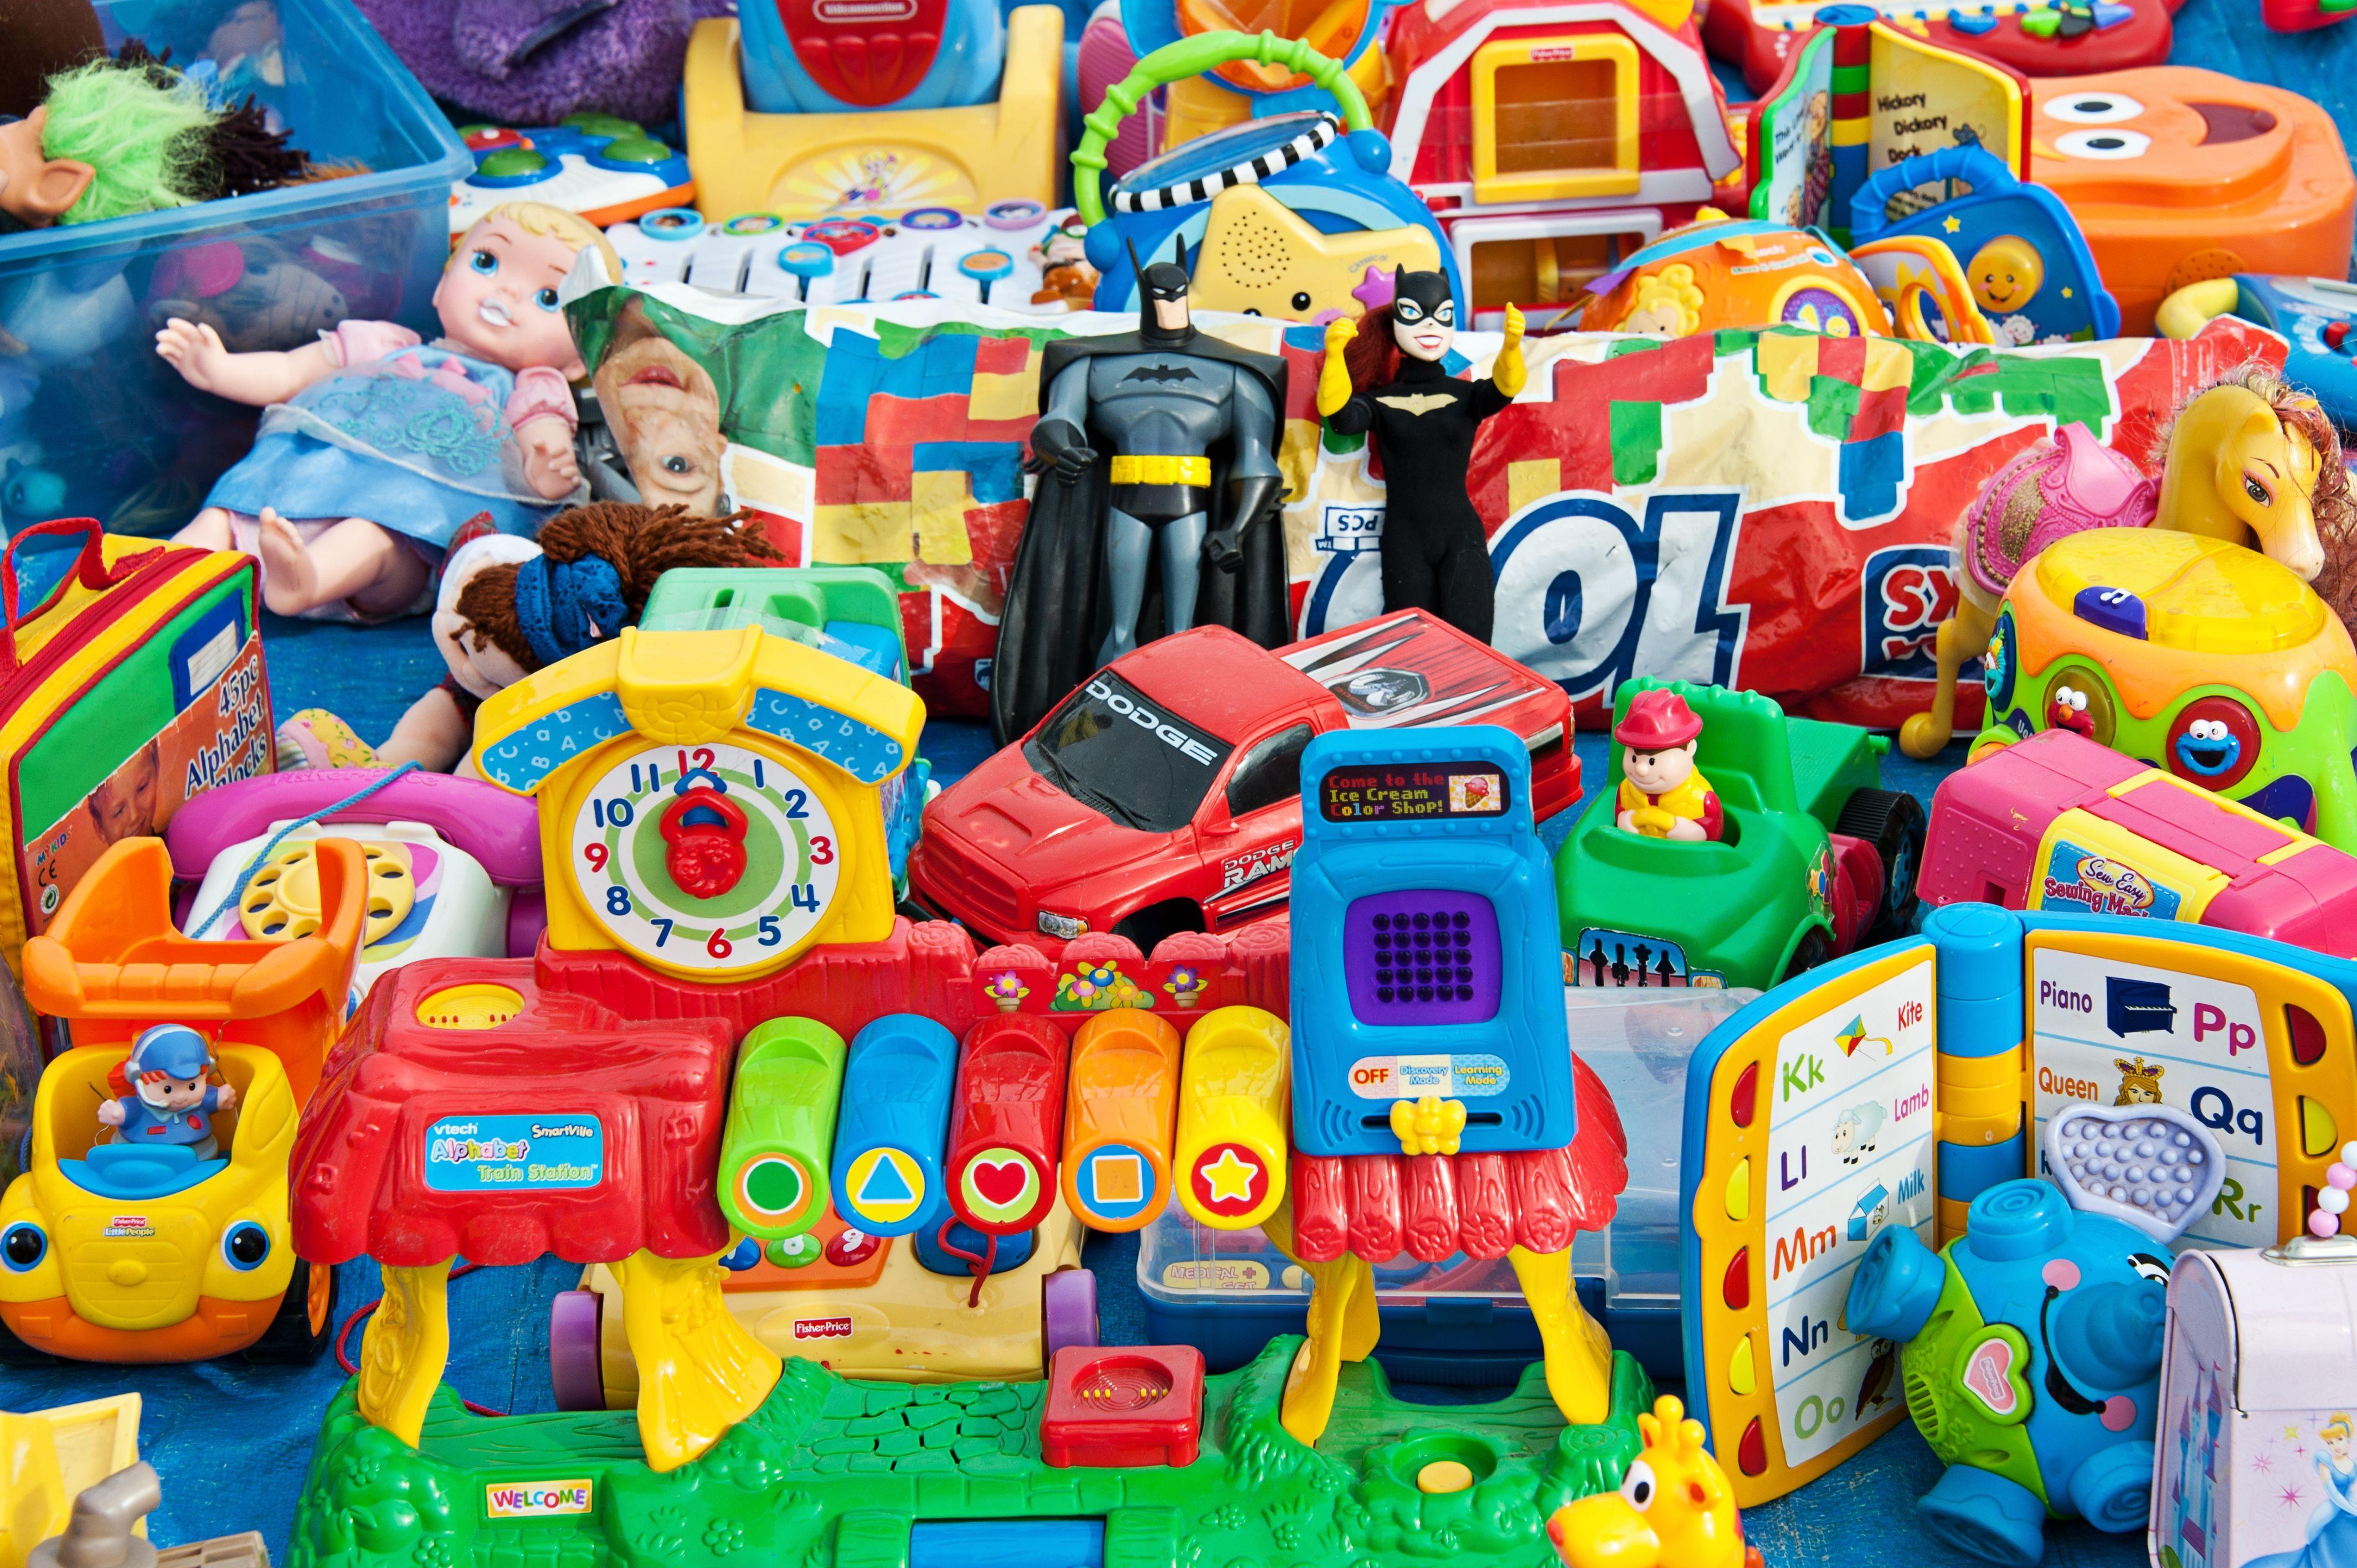 Montaje de juguetes